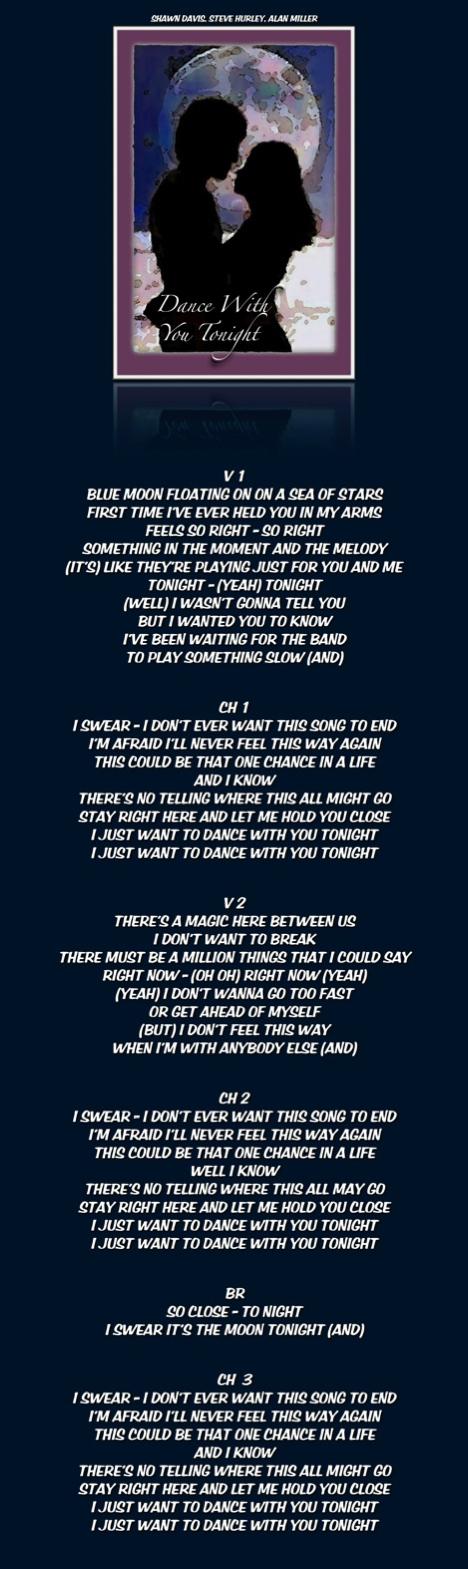 dont mine at night lyrics